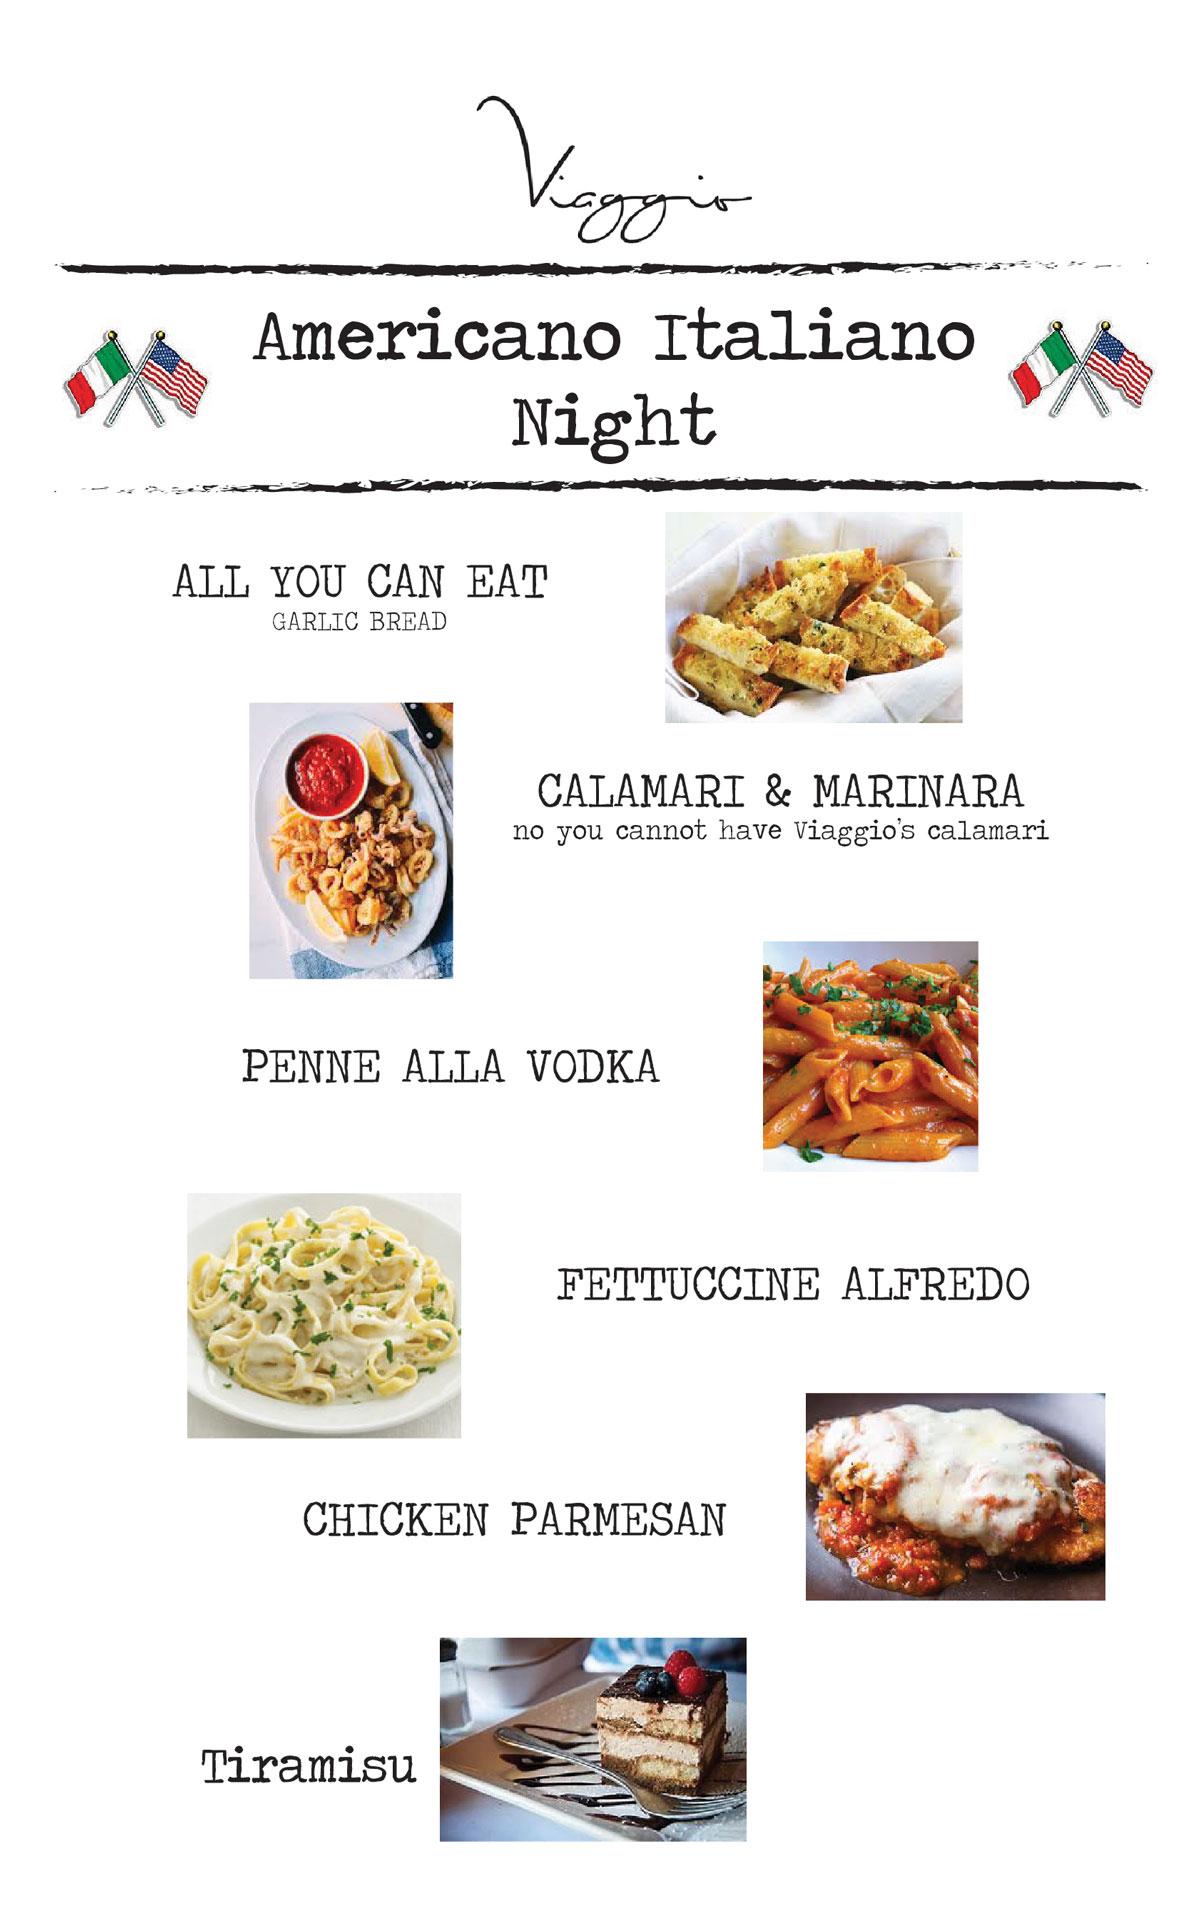 American-Italiano-Night-menu